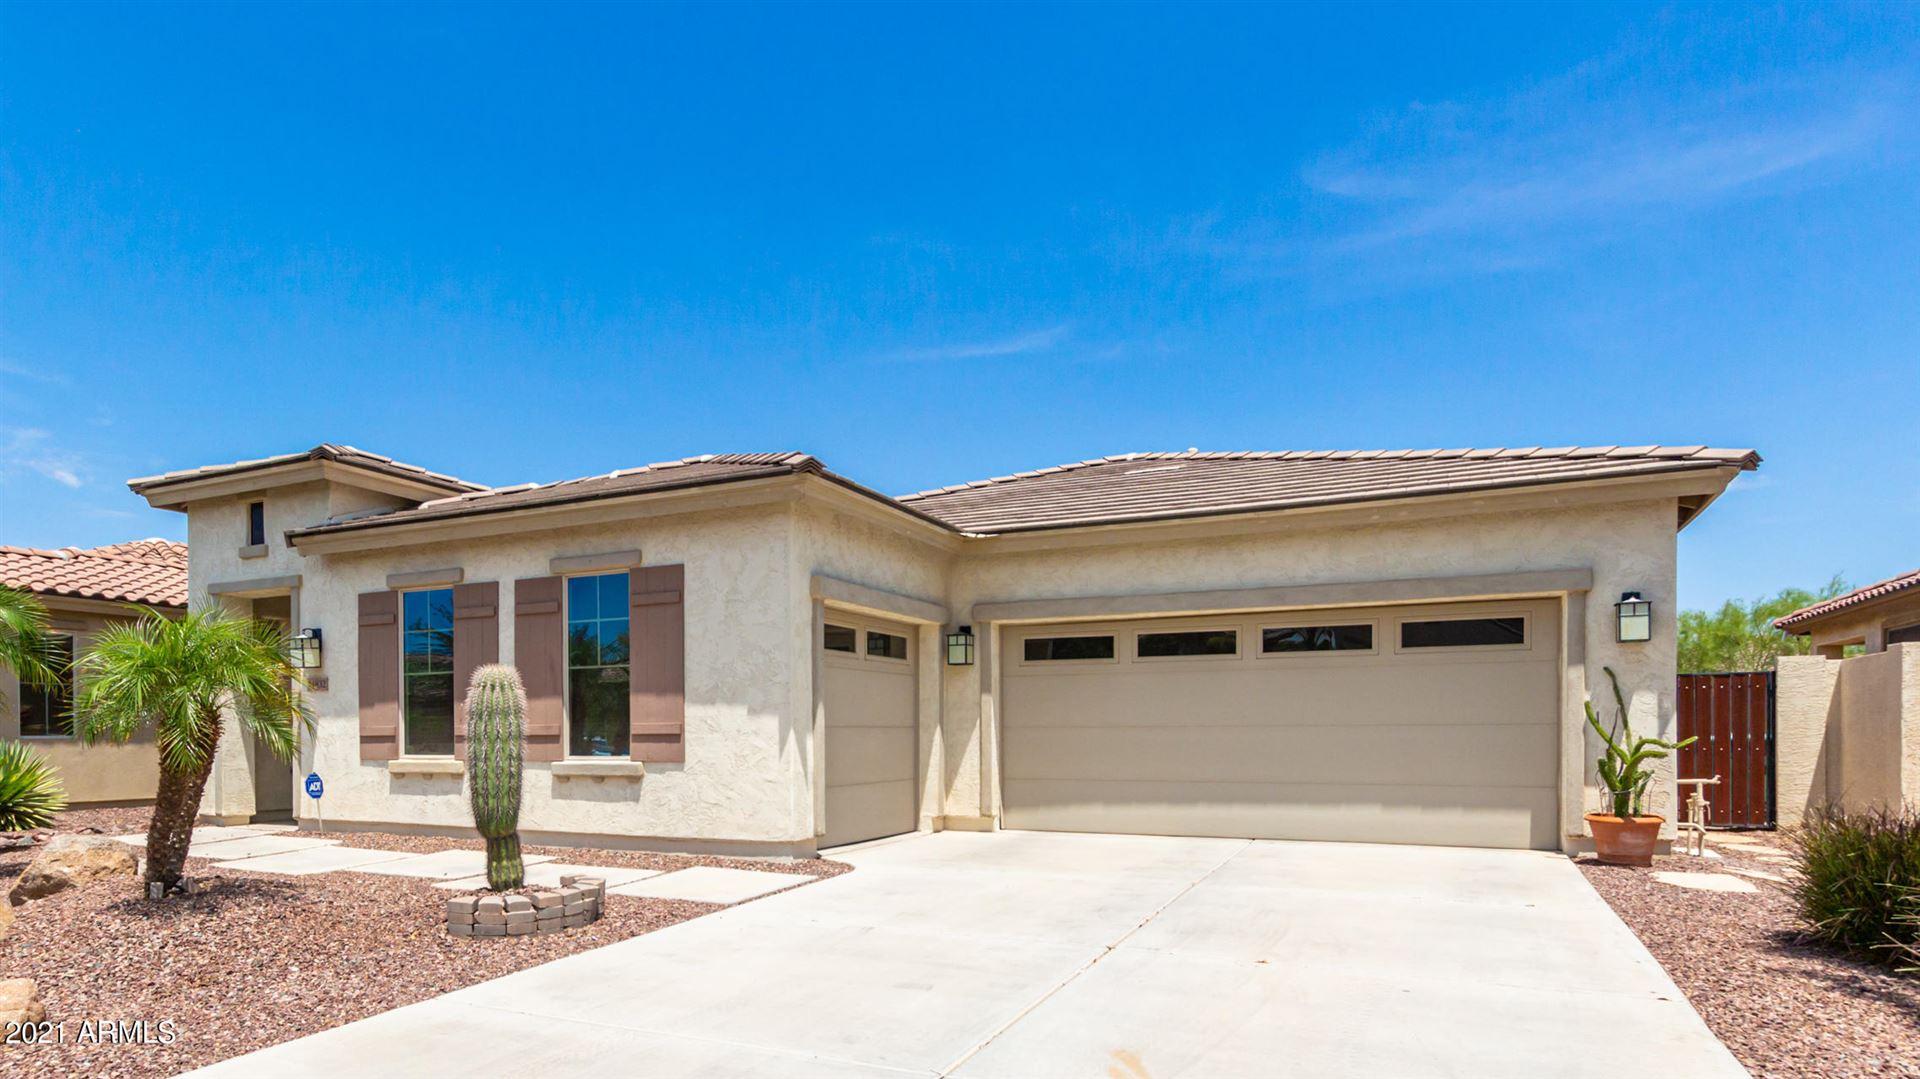 Photo of 14832 W Luna Drive S, Litchfield Park, AZ 85340 (MLS # 6268088)